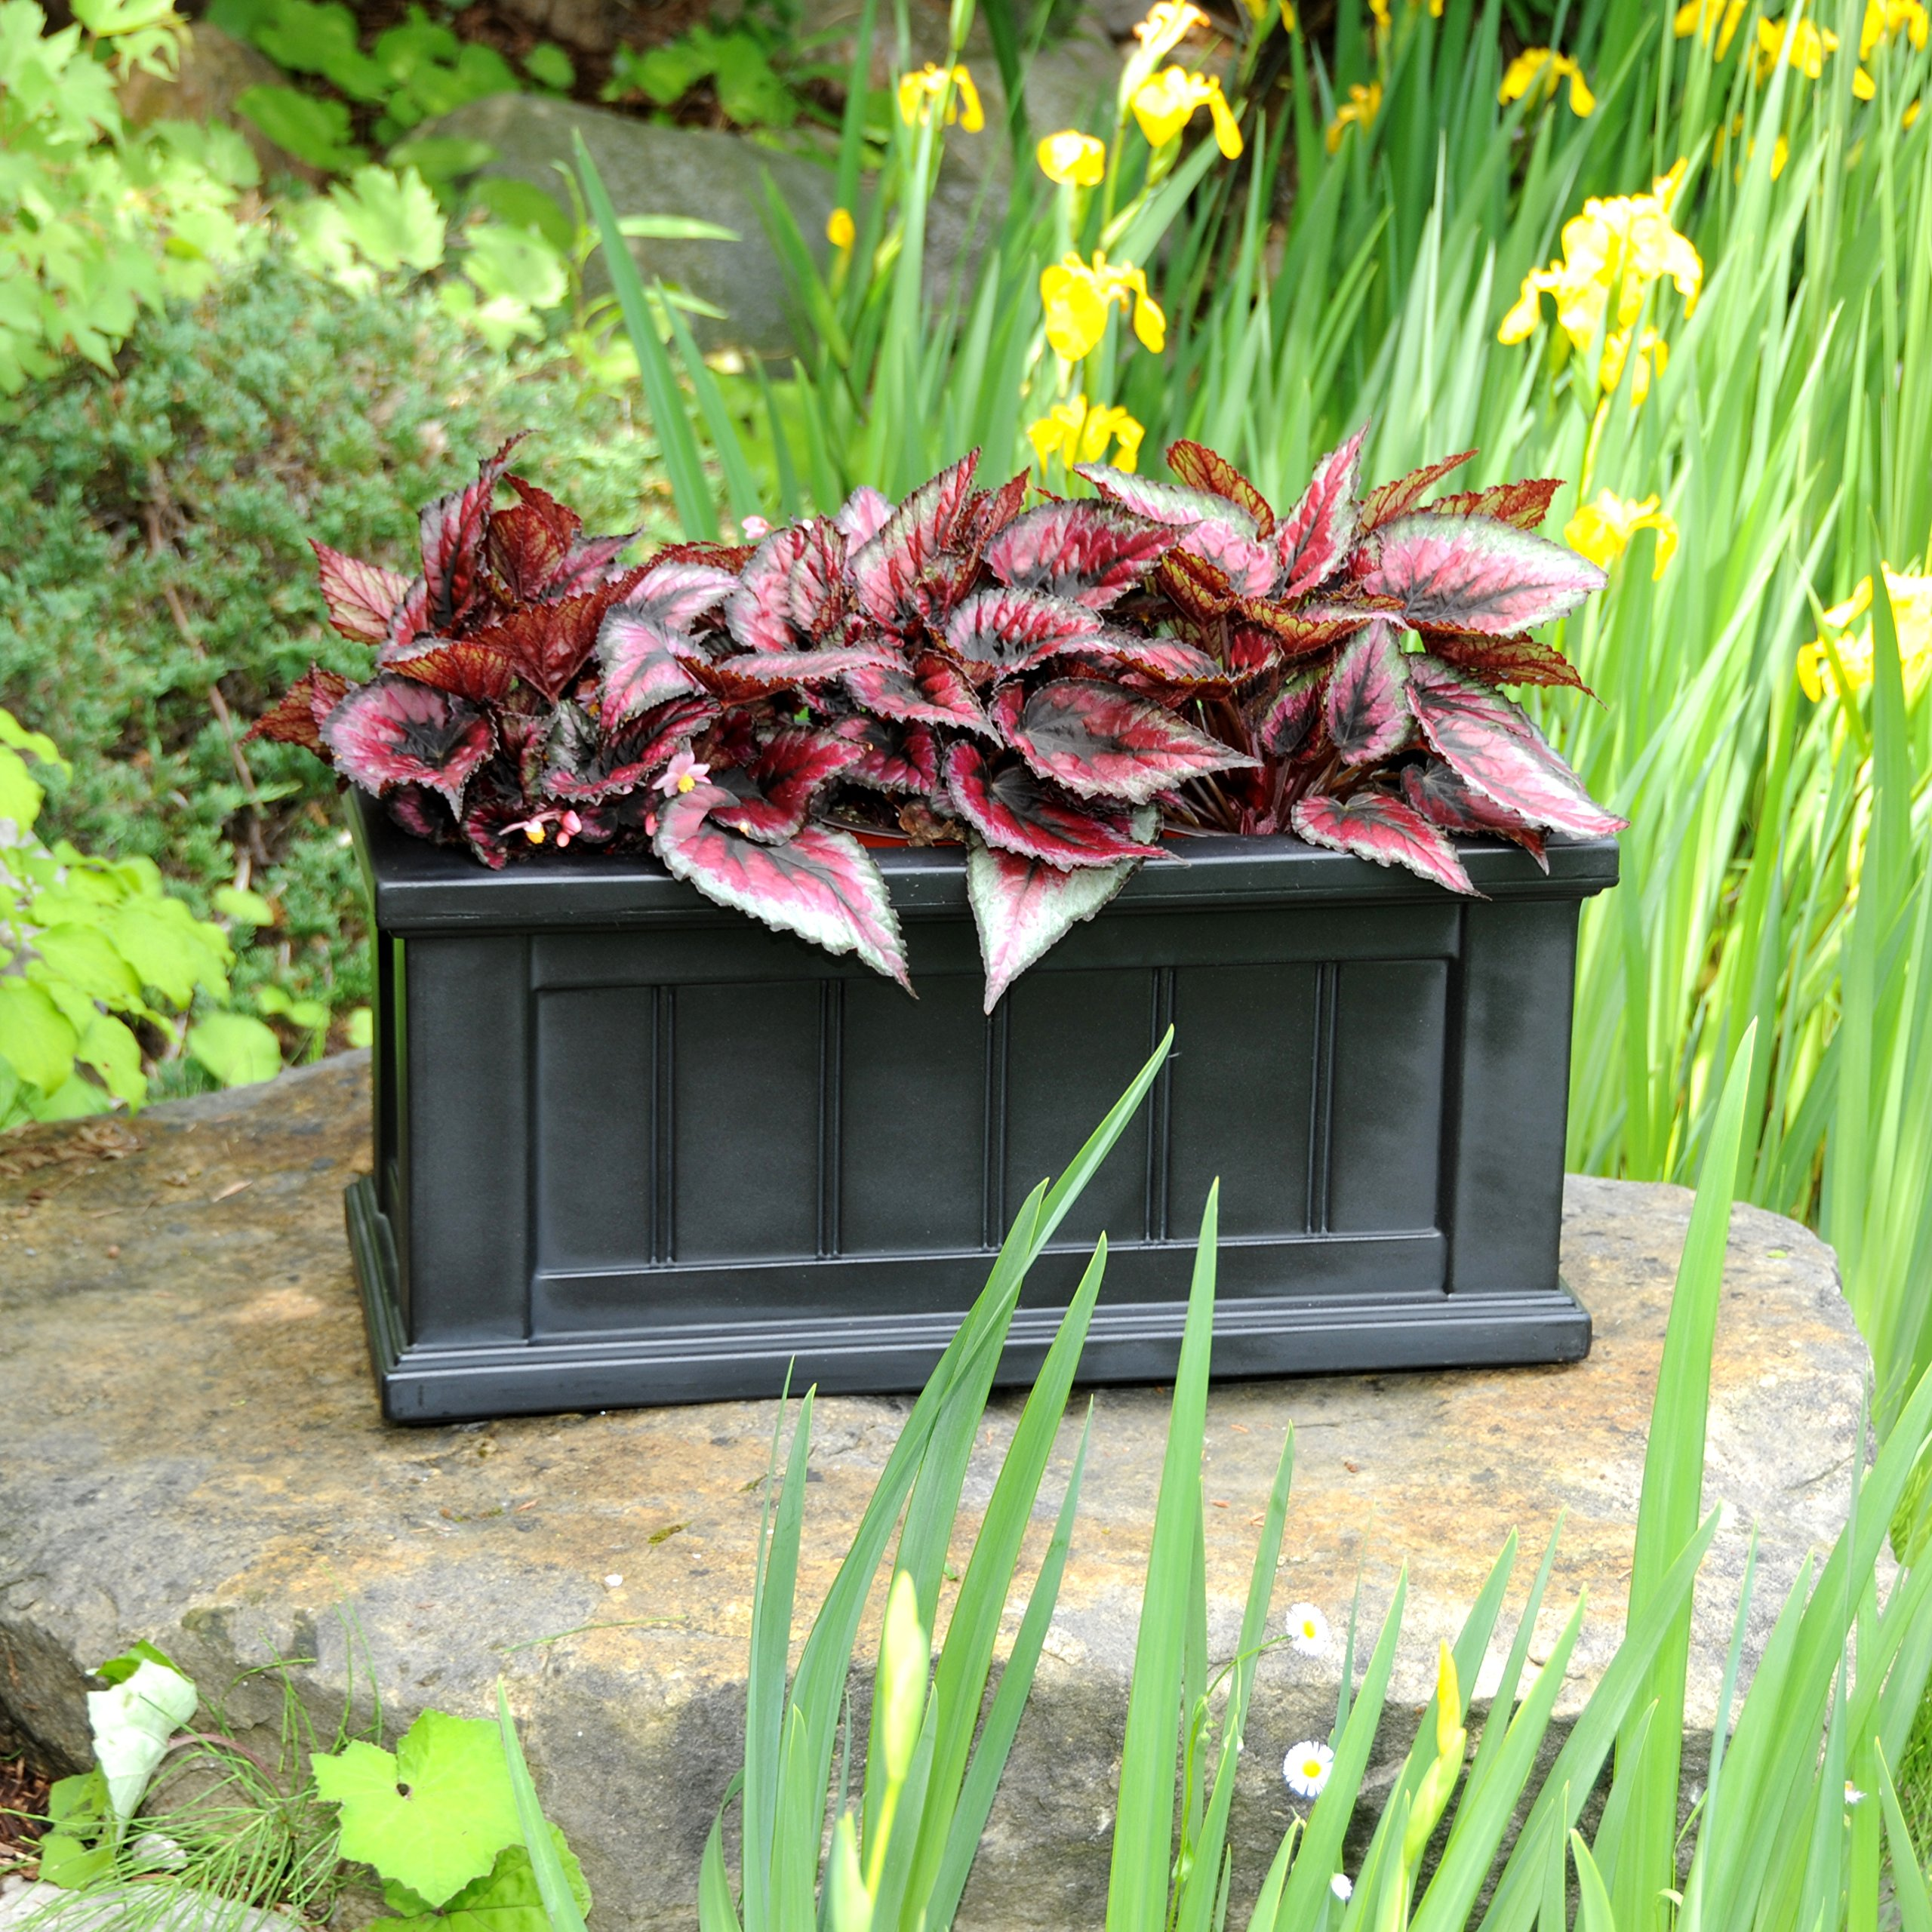 Mayne 4839-B Cape Cod Patio 24x11 Polyethylene Planter, 24'' x 11'', Black